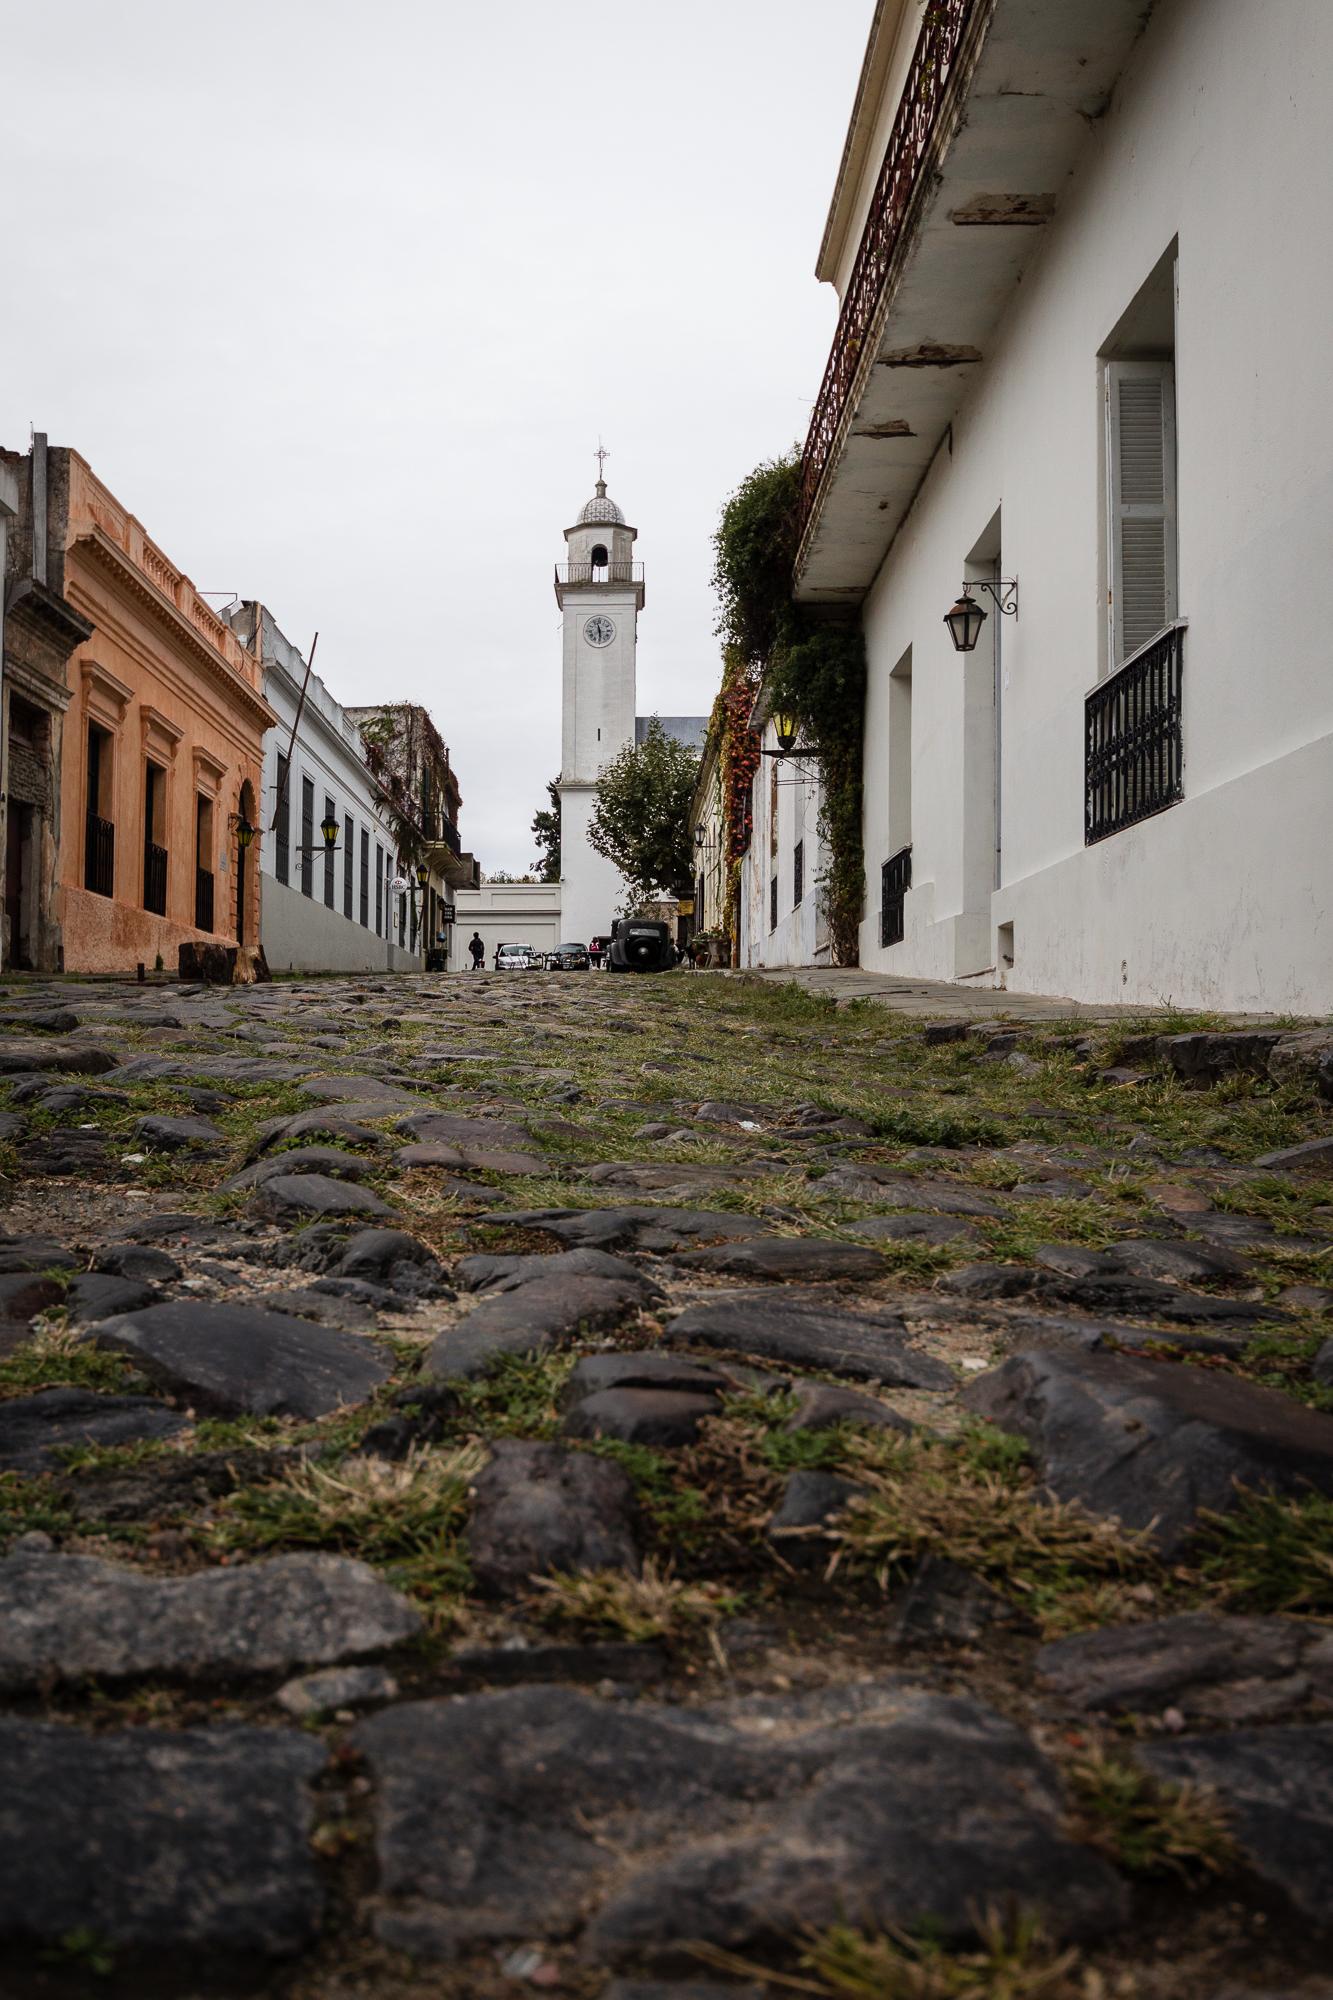 rue pavée colonia el sacramento